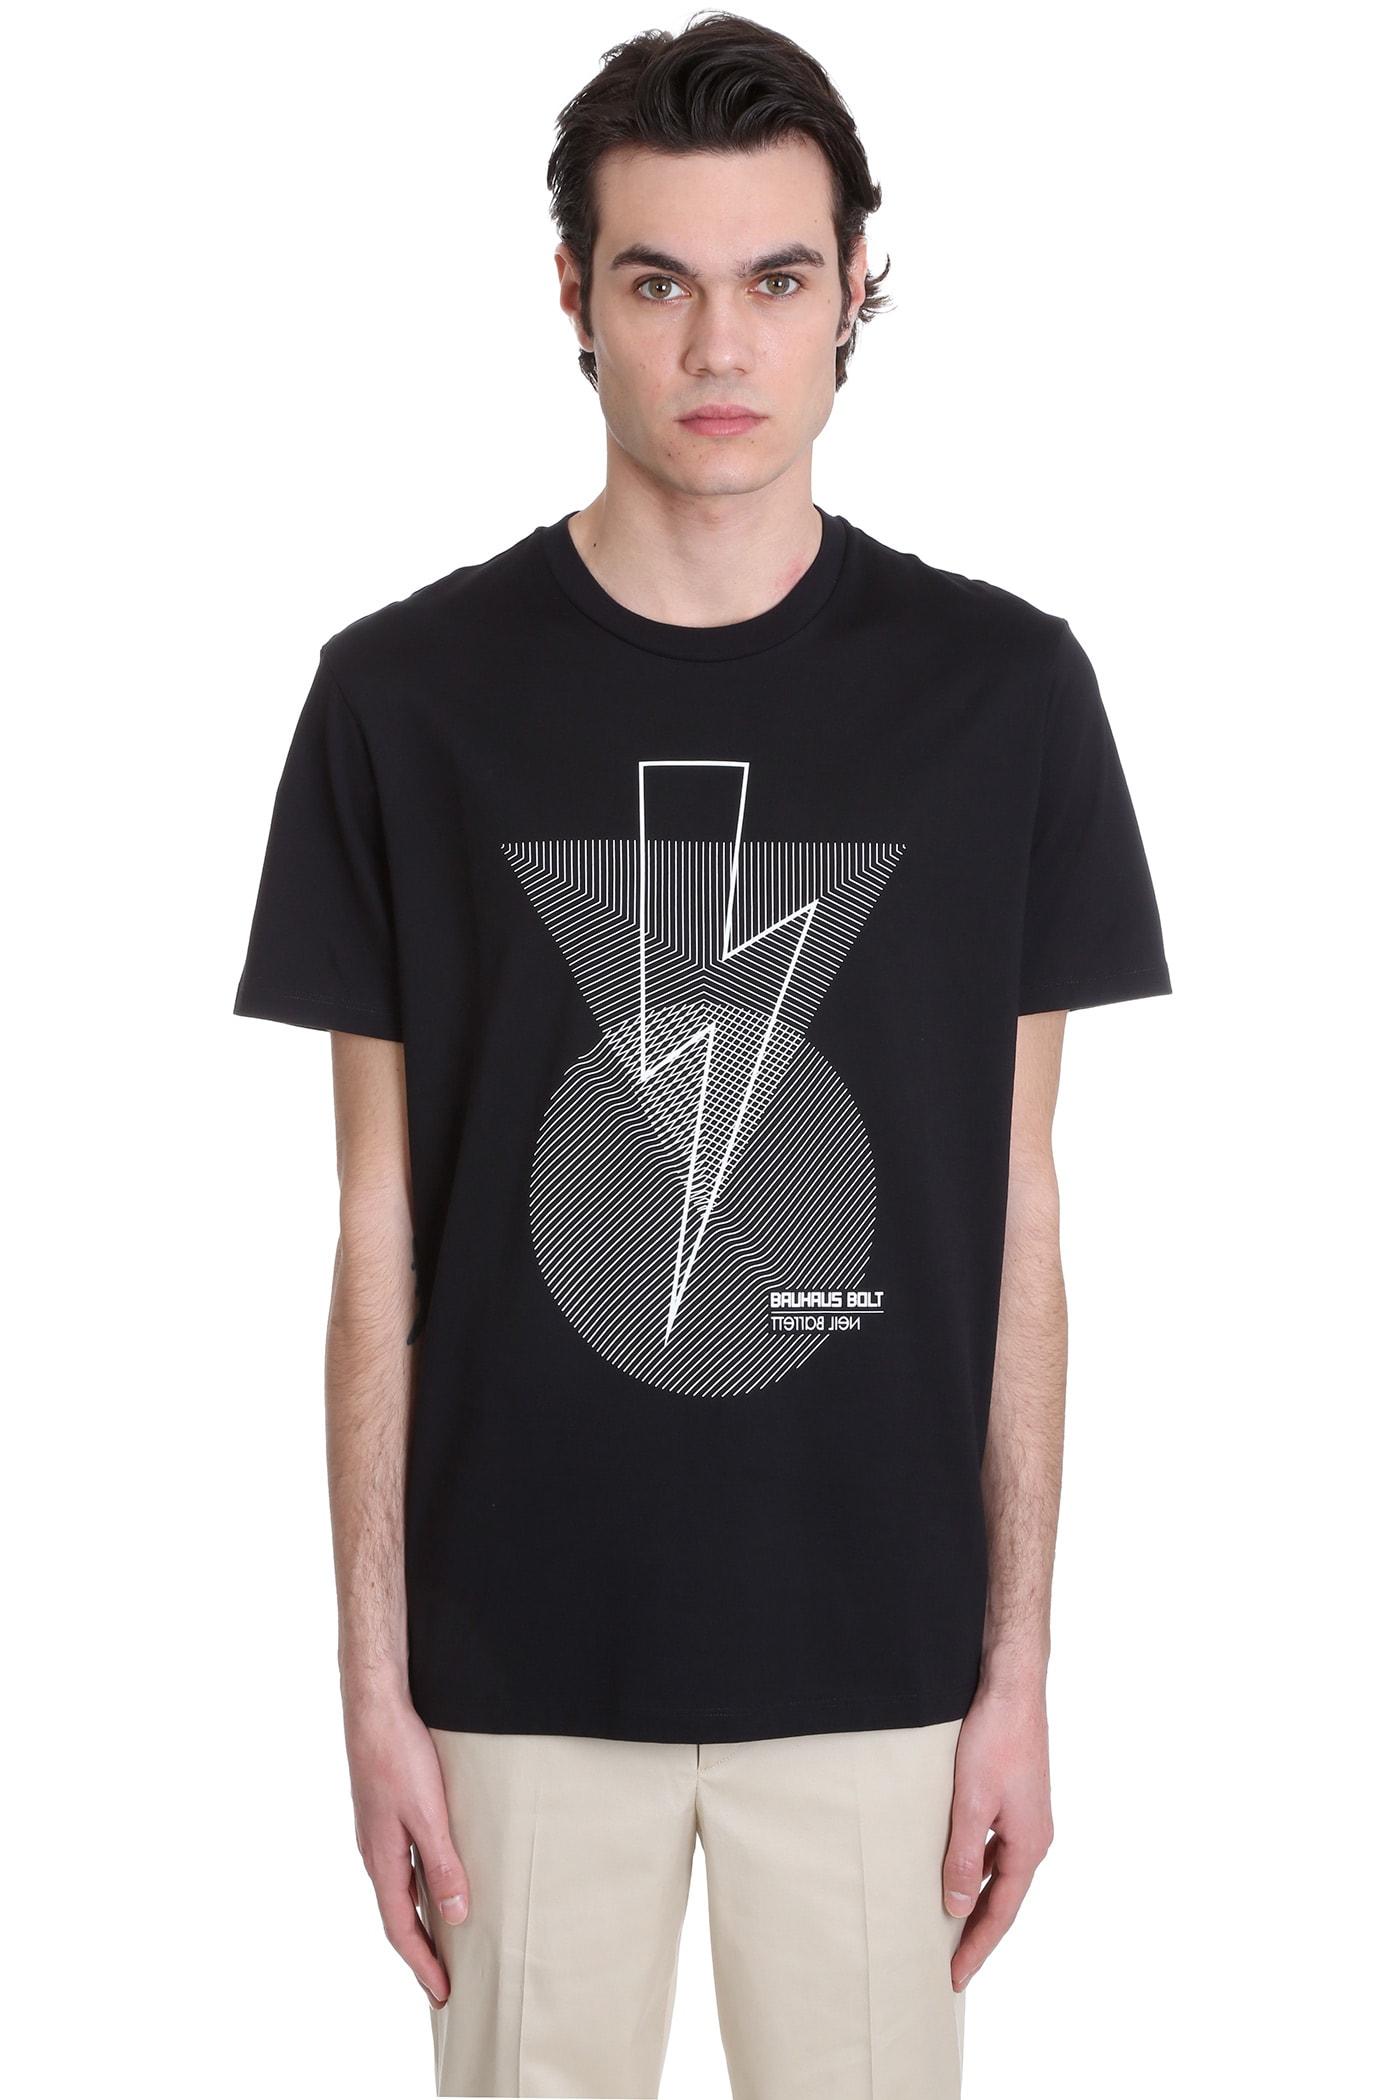 T-shirt In Black Cotton